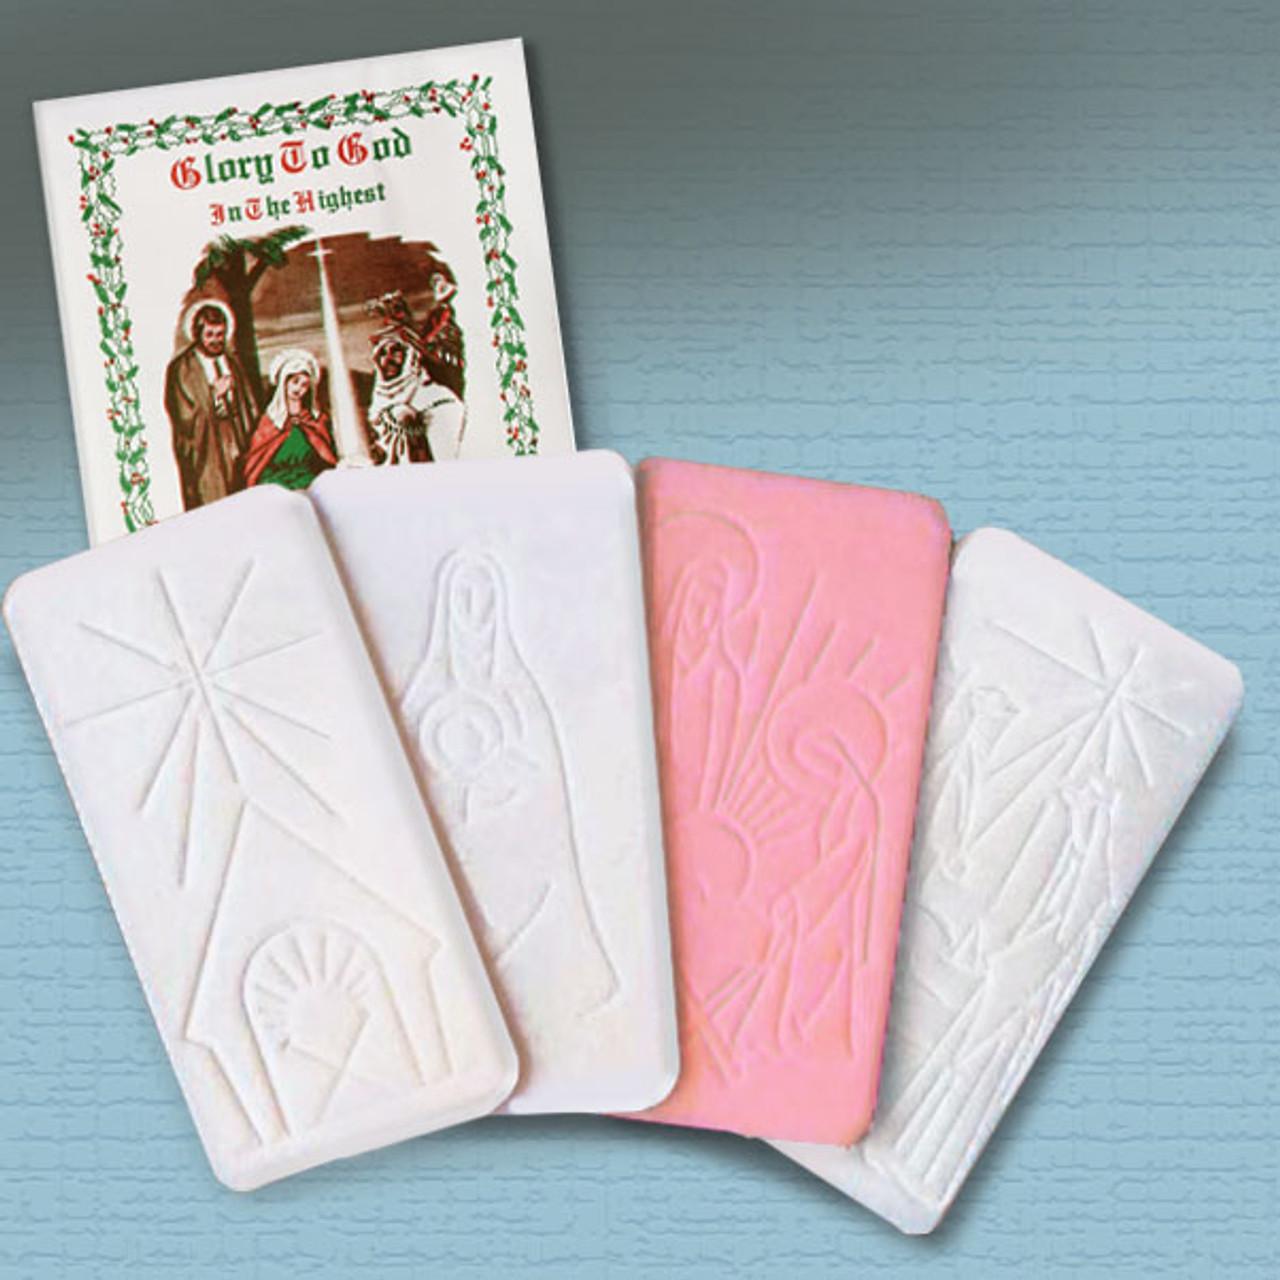 Oplatki Christmas Wafer Packet of 4